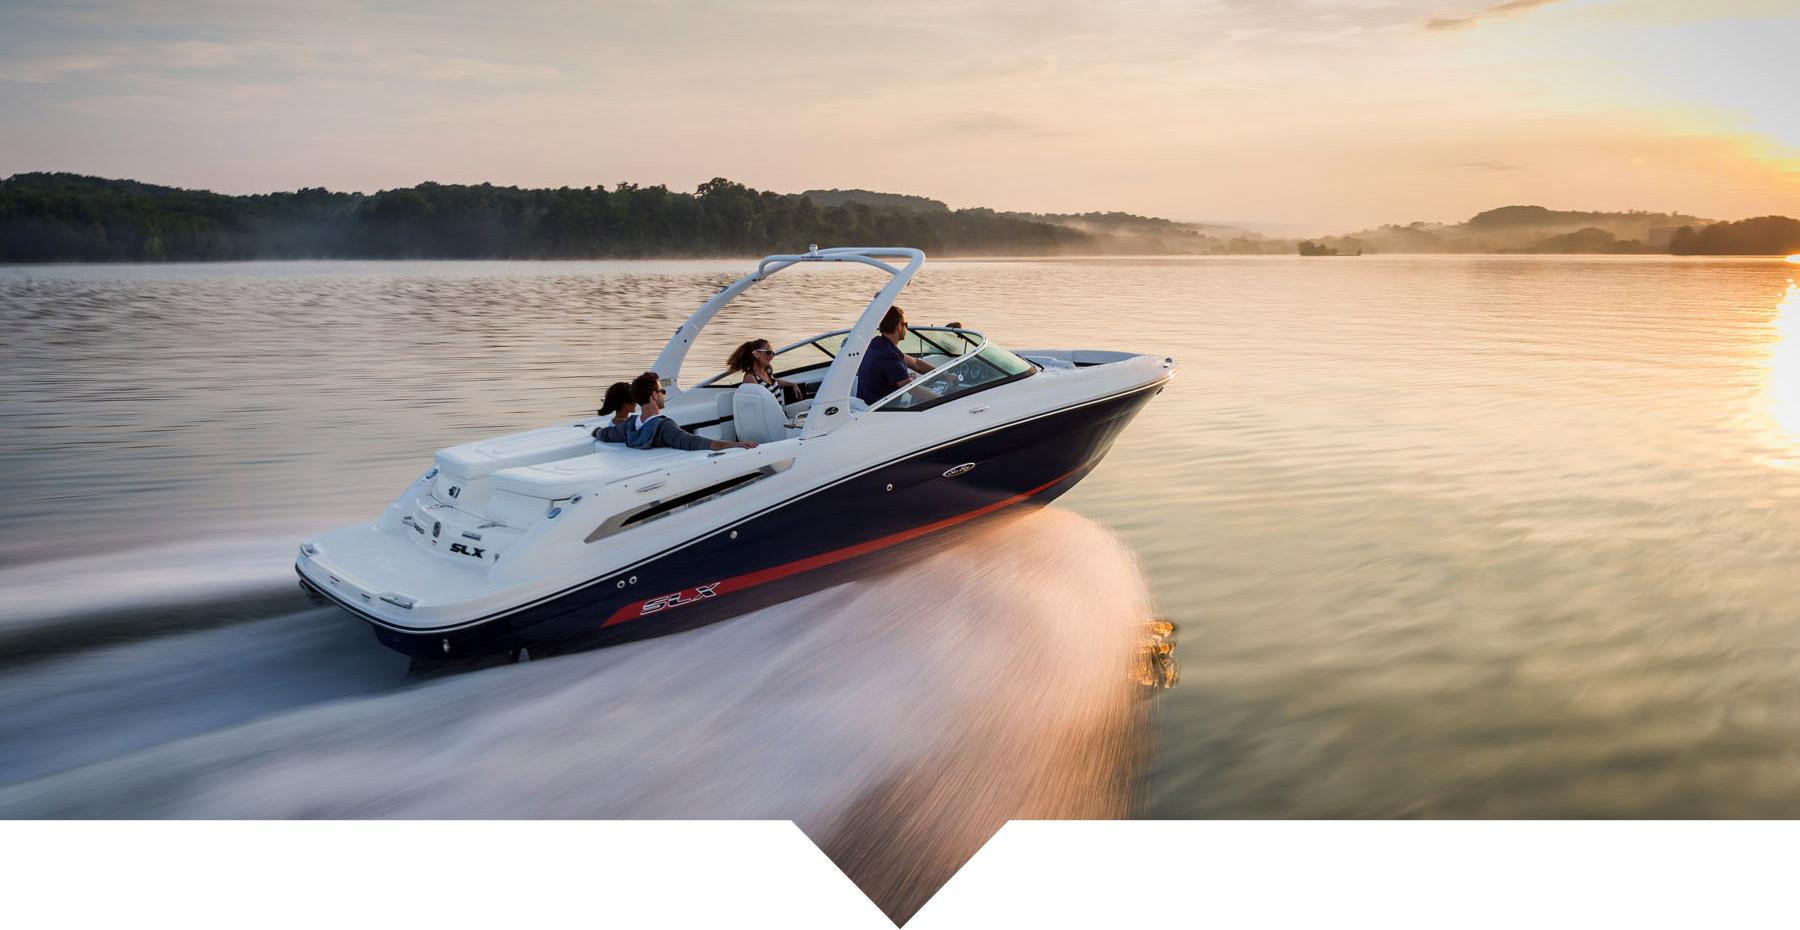 Boot Mieten Gardasee Bardolino